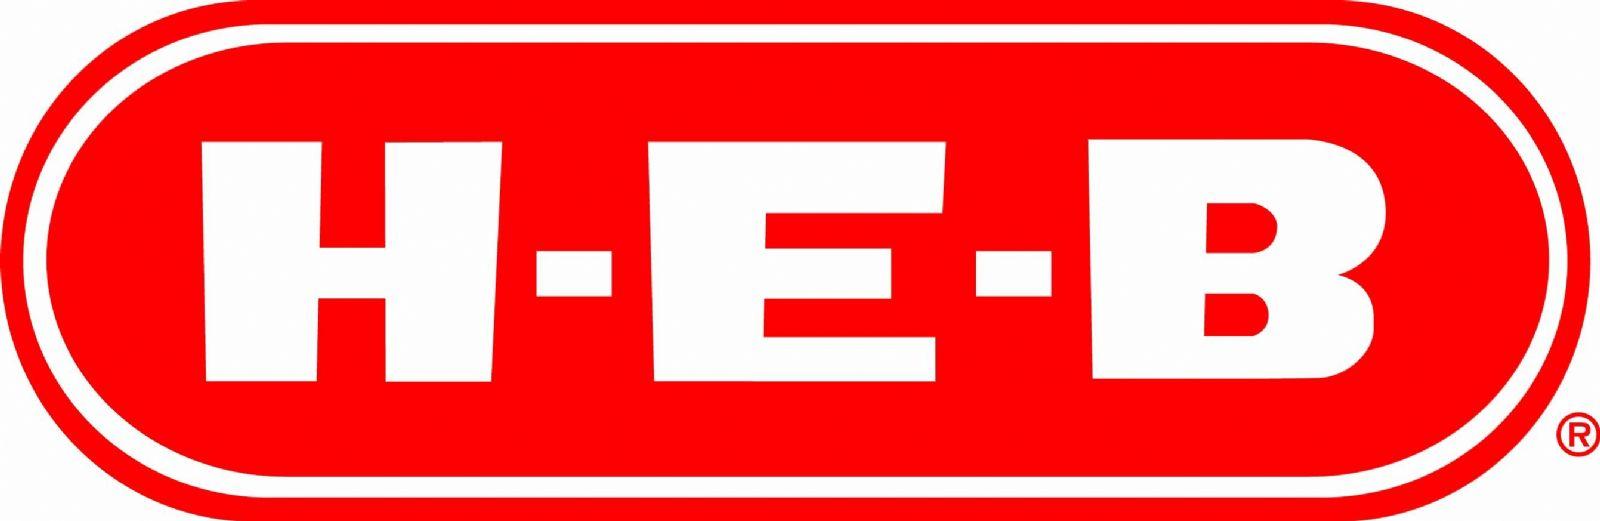 H-E-B.jpg